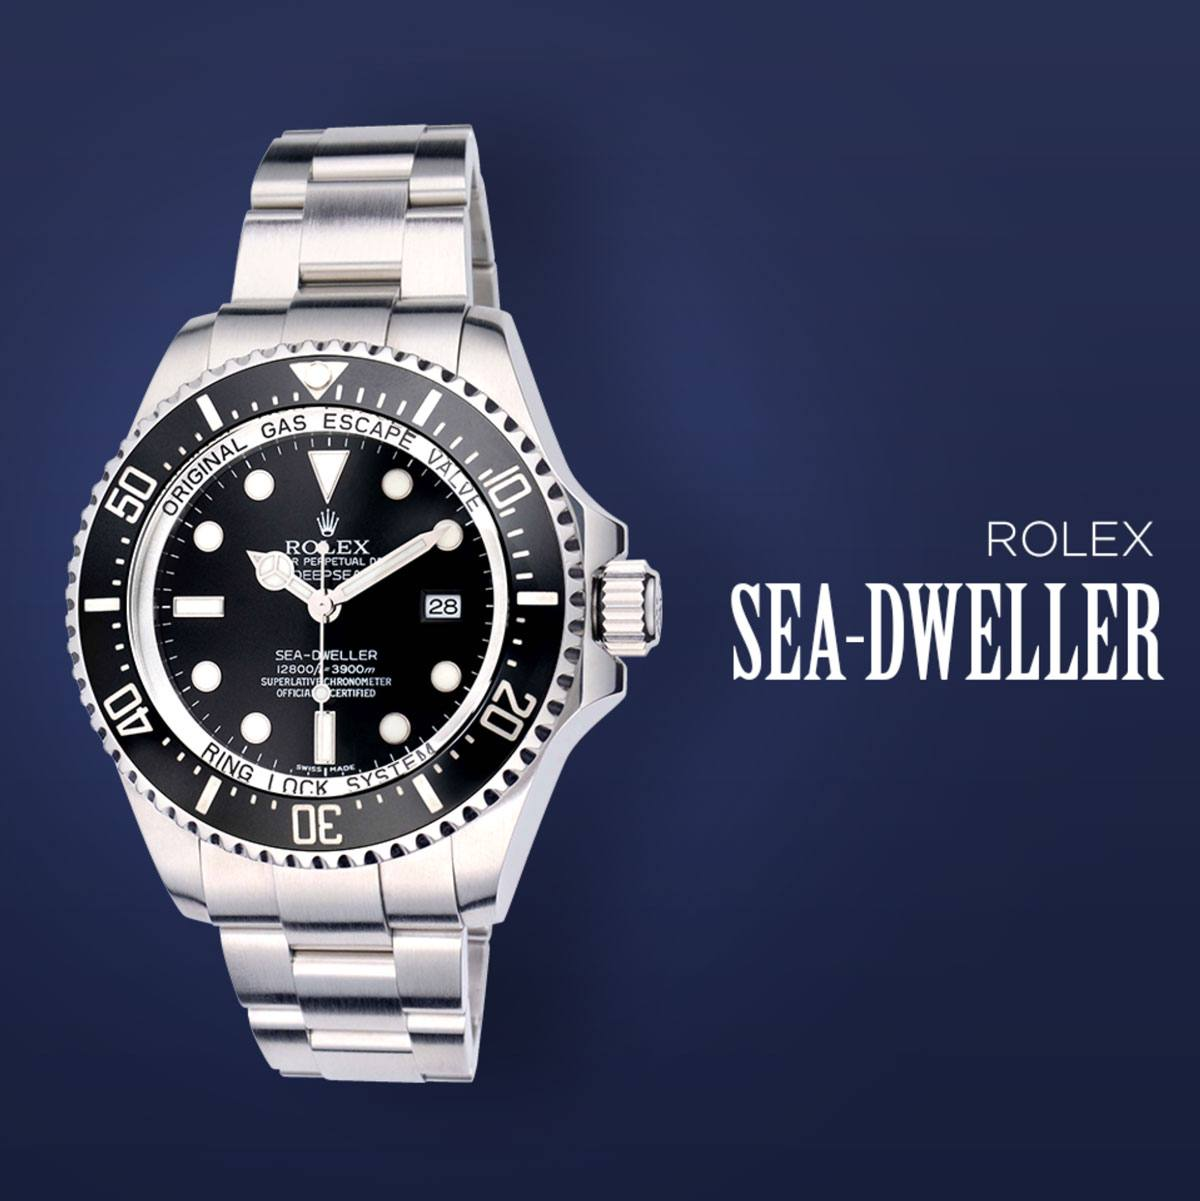 the rolex sea dweller